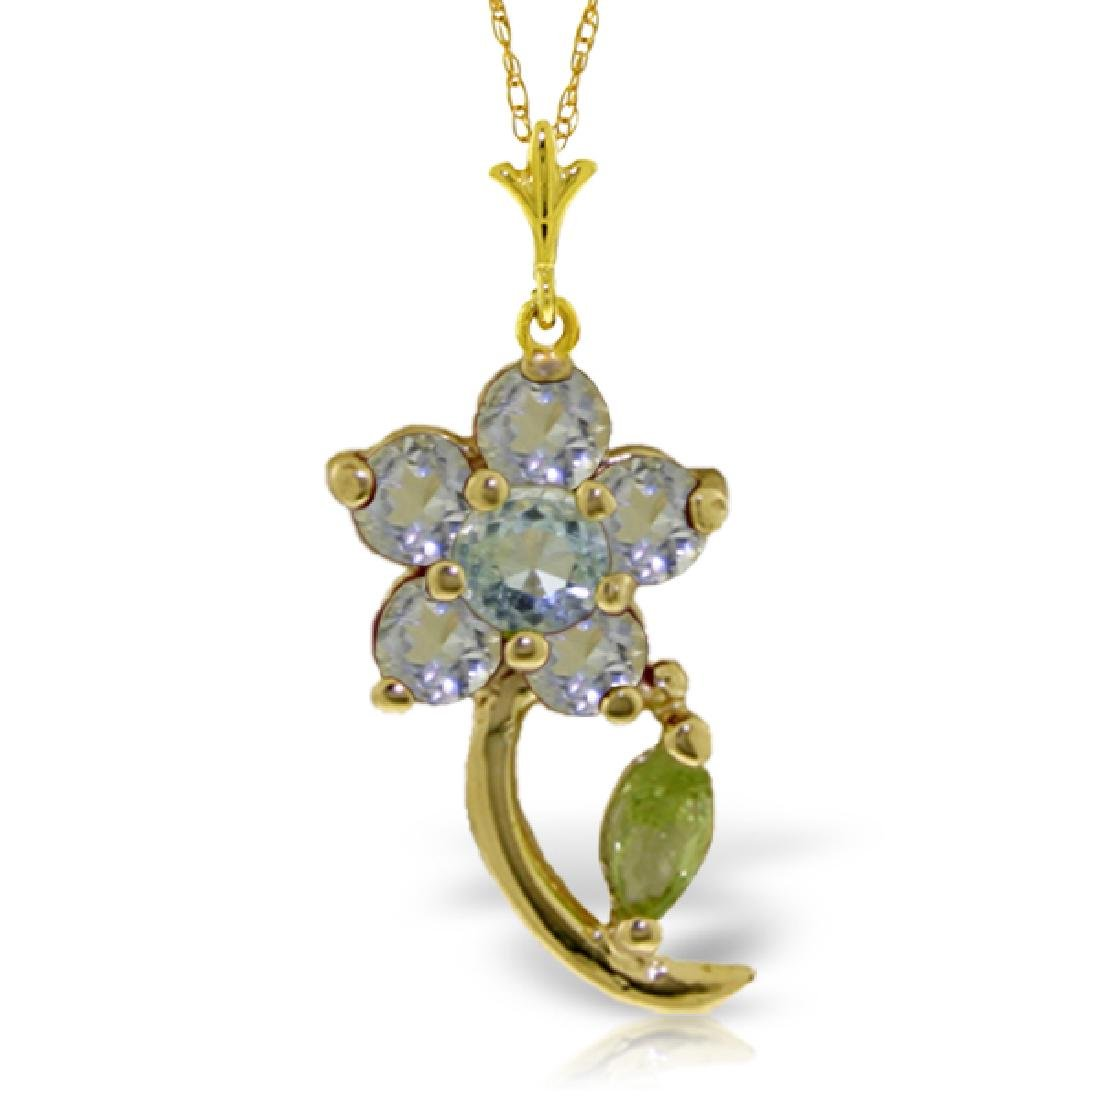 Genuine 0.87 ctw Aquamarine & Pearl Necklace Jewelry